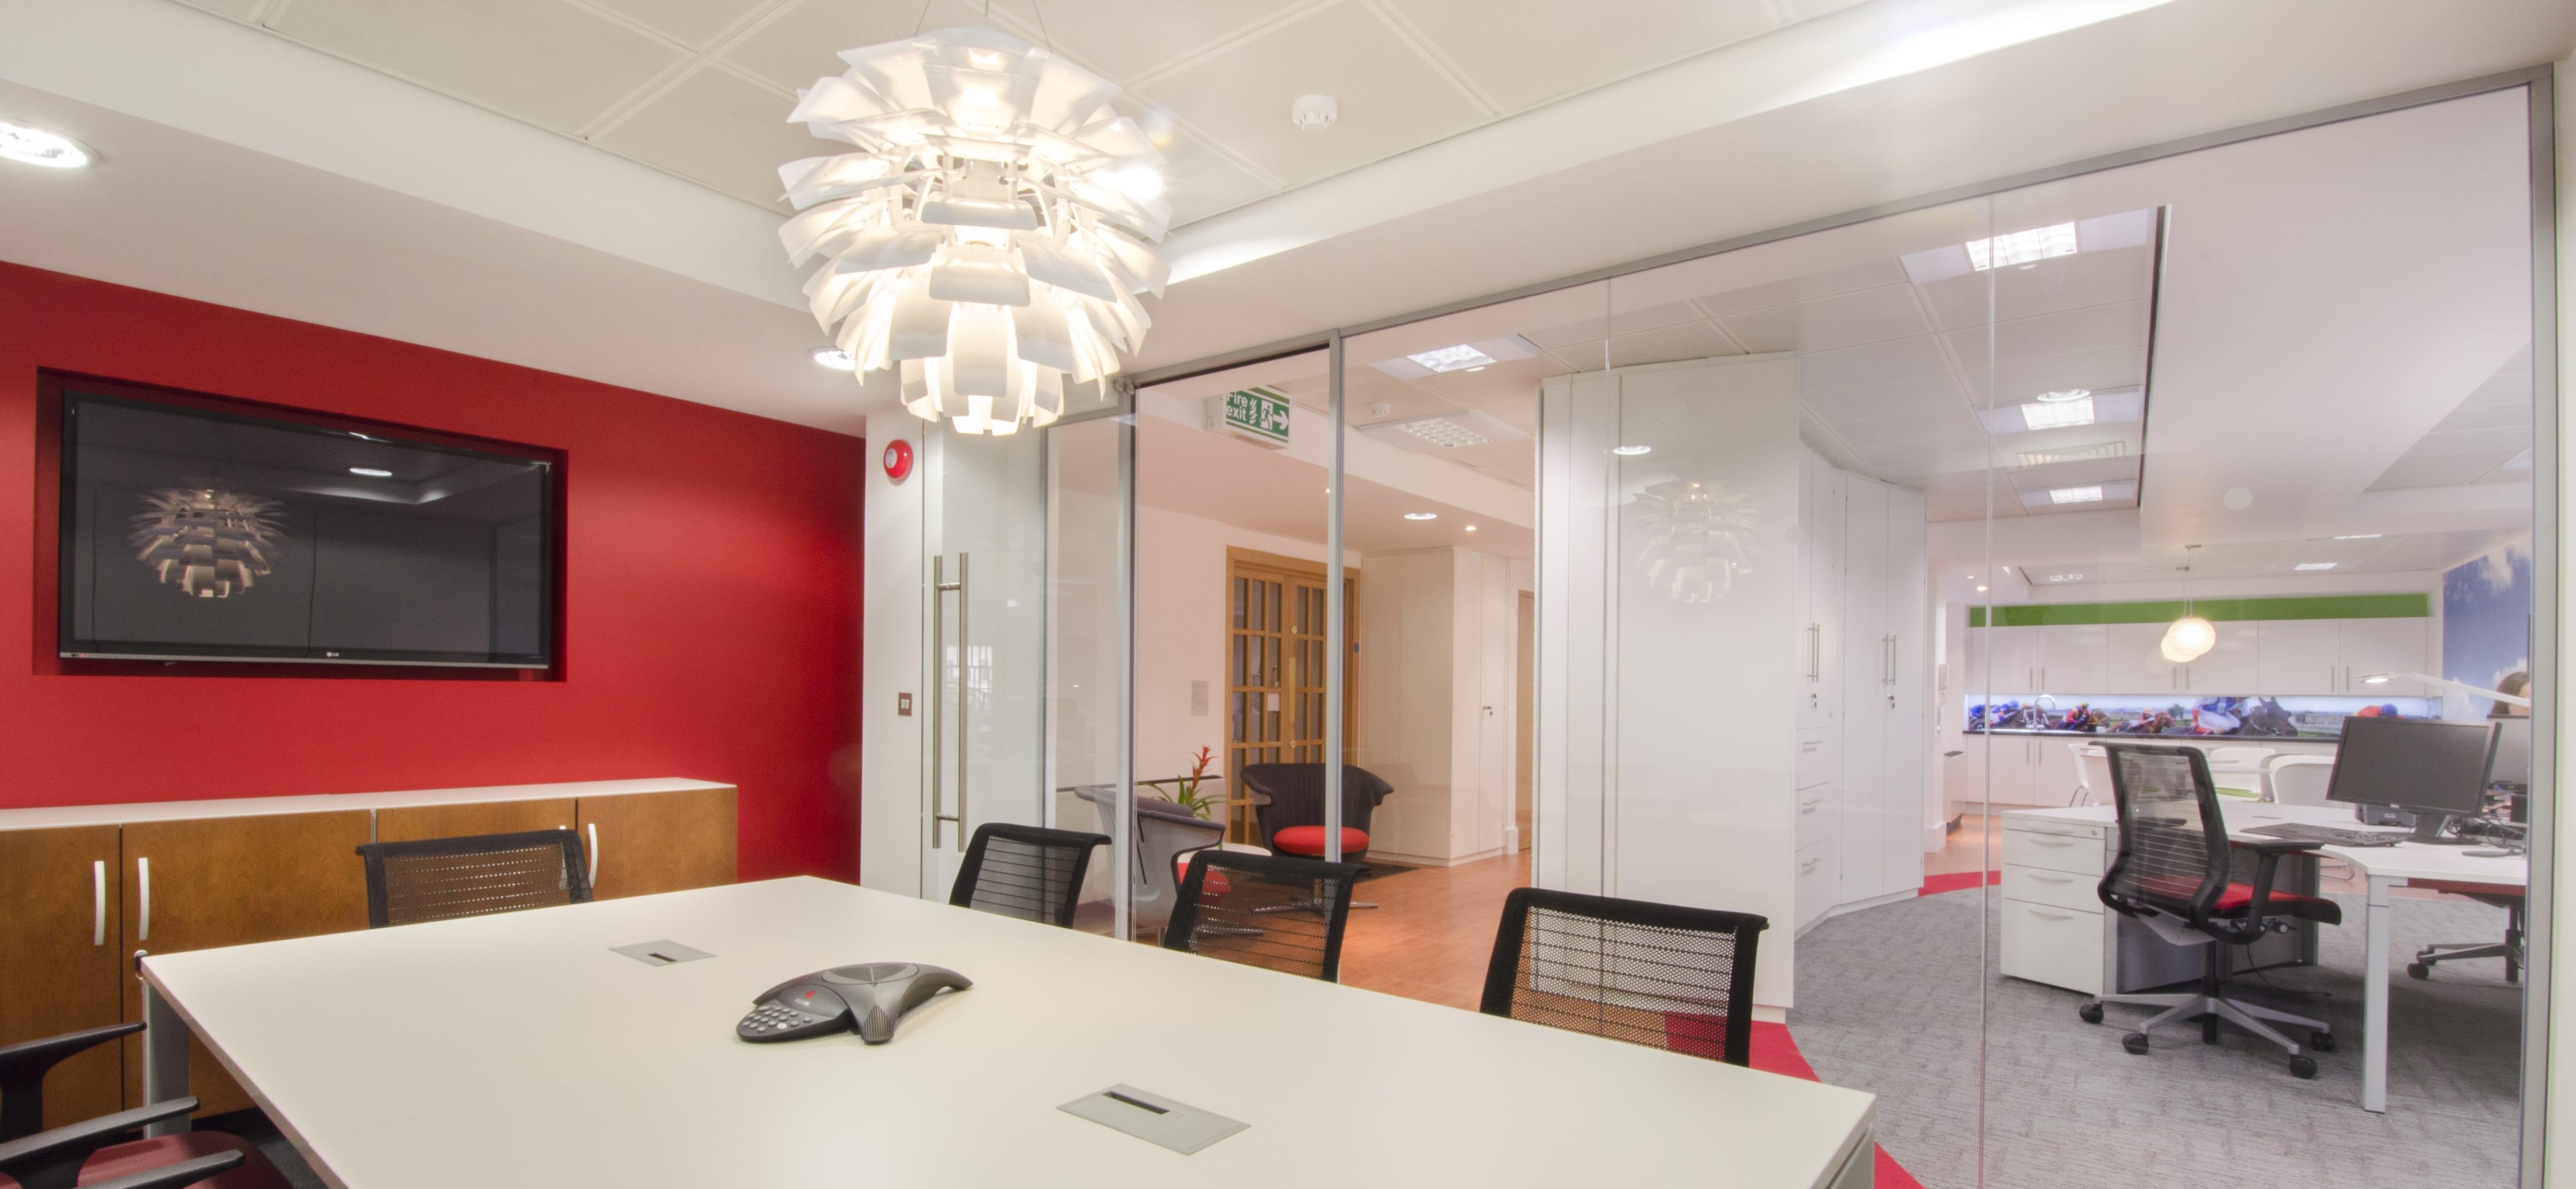 Marine Capital Business Interiors